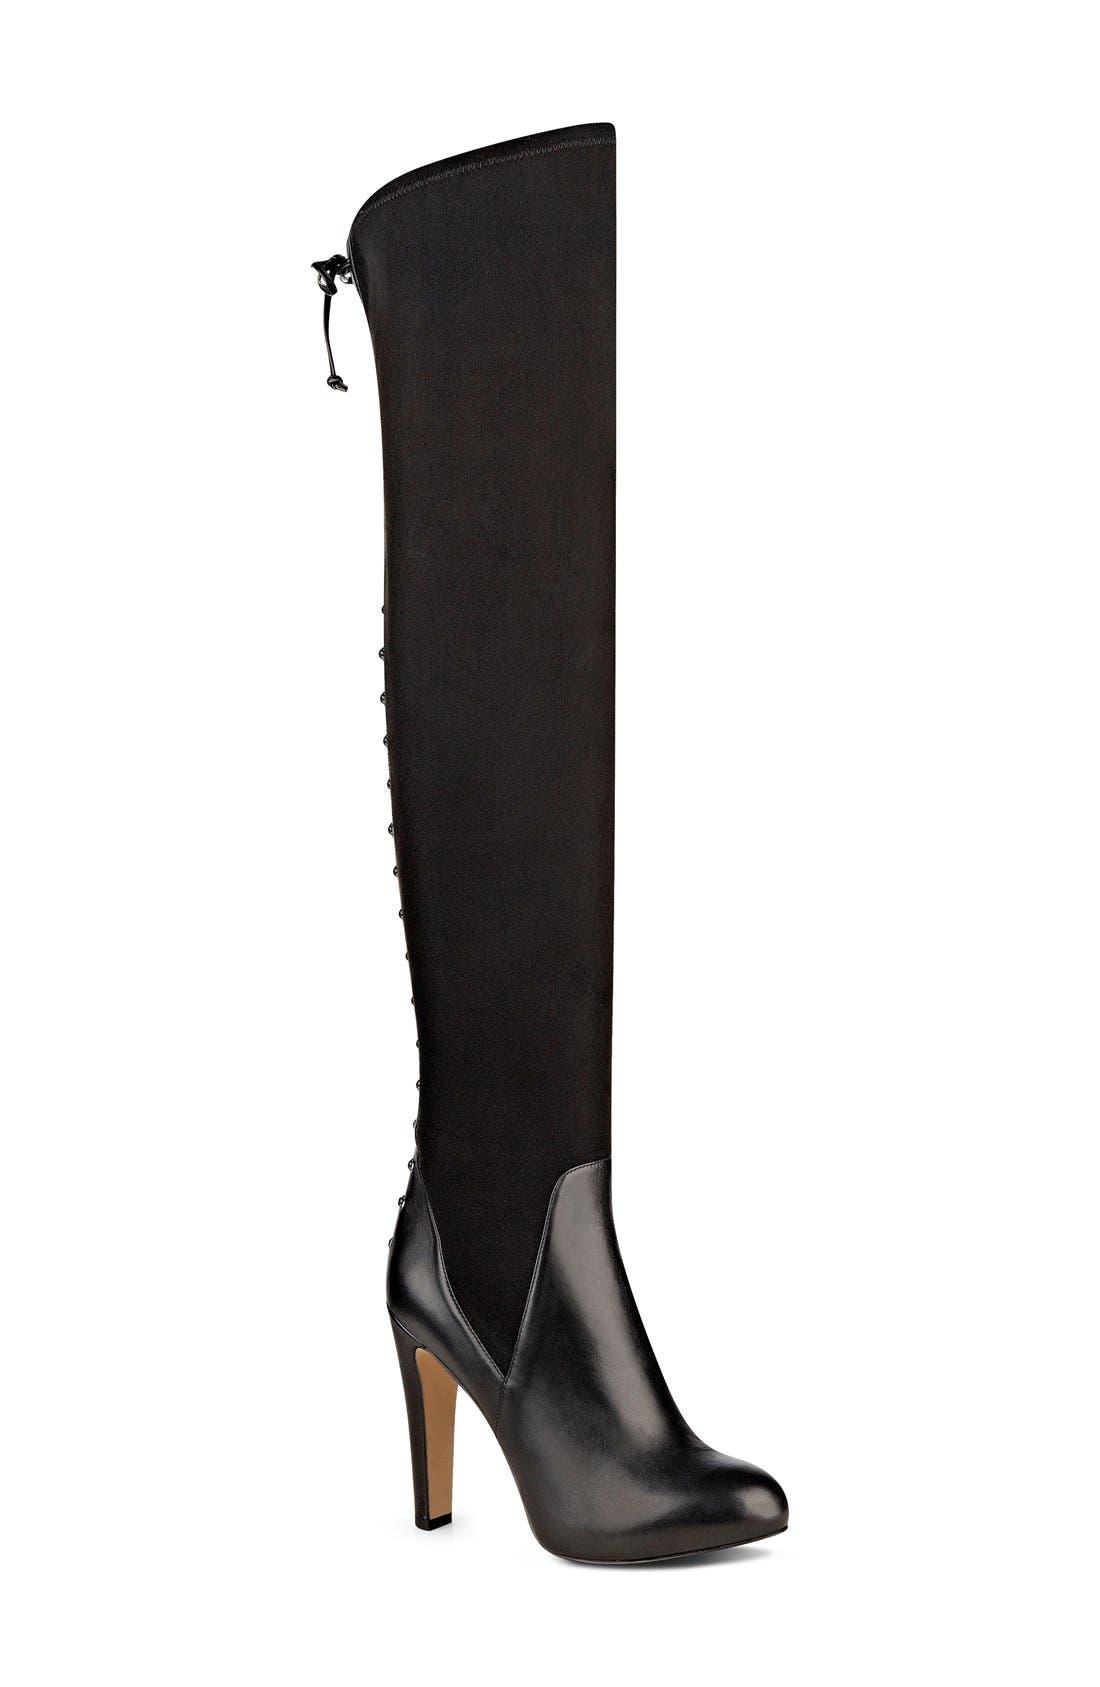 Alternate Image 1 Selected - Nine West 'Brennan' Over the Knee Boot (Women)